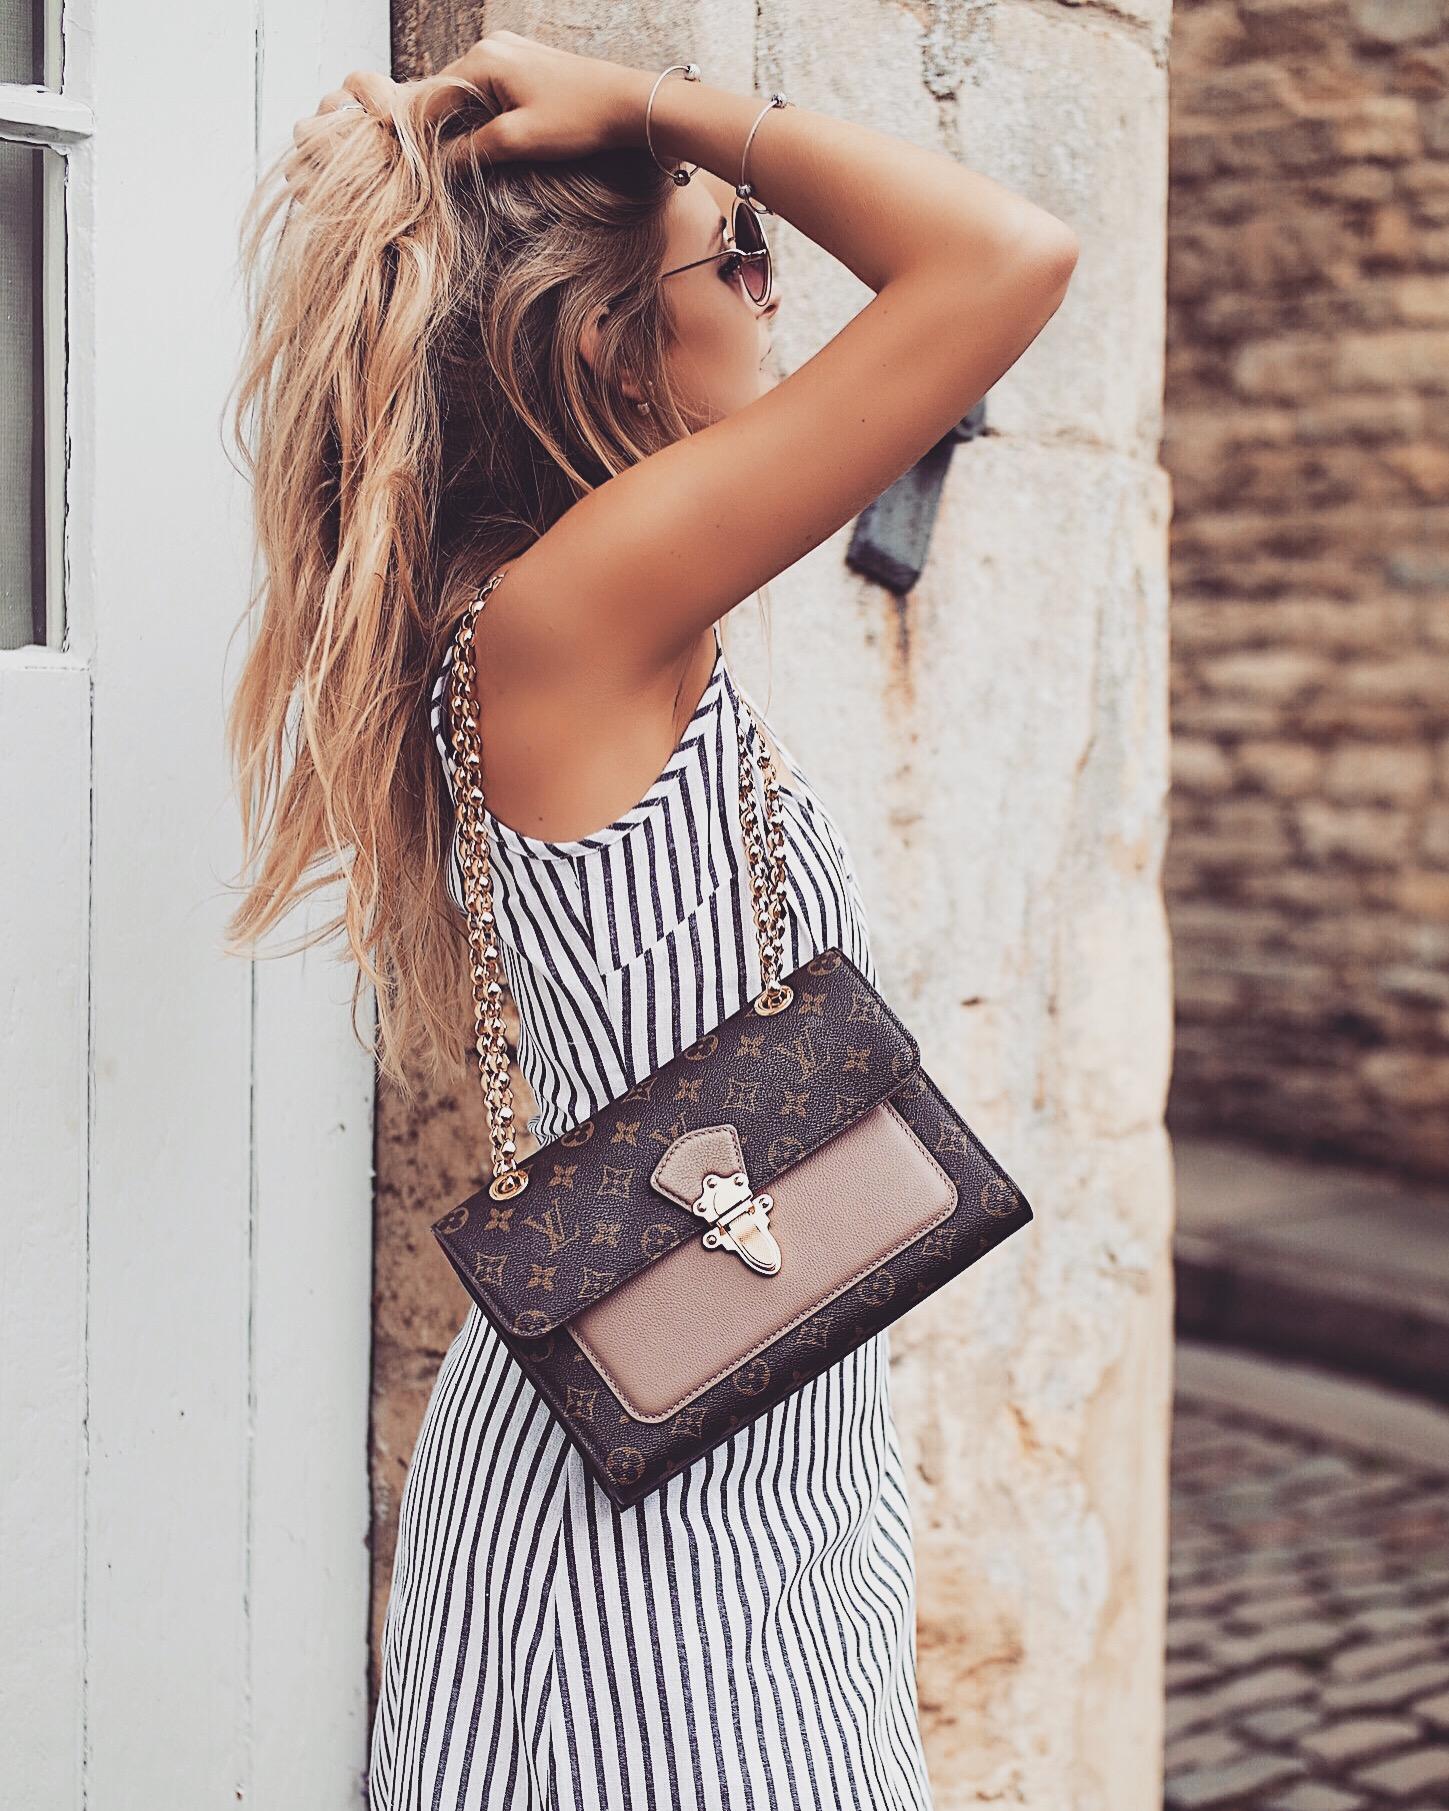 The Wrap Dress -Louis Vuitton Chain Bag